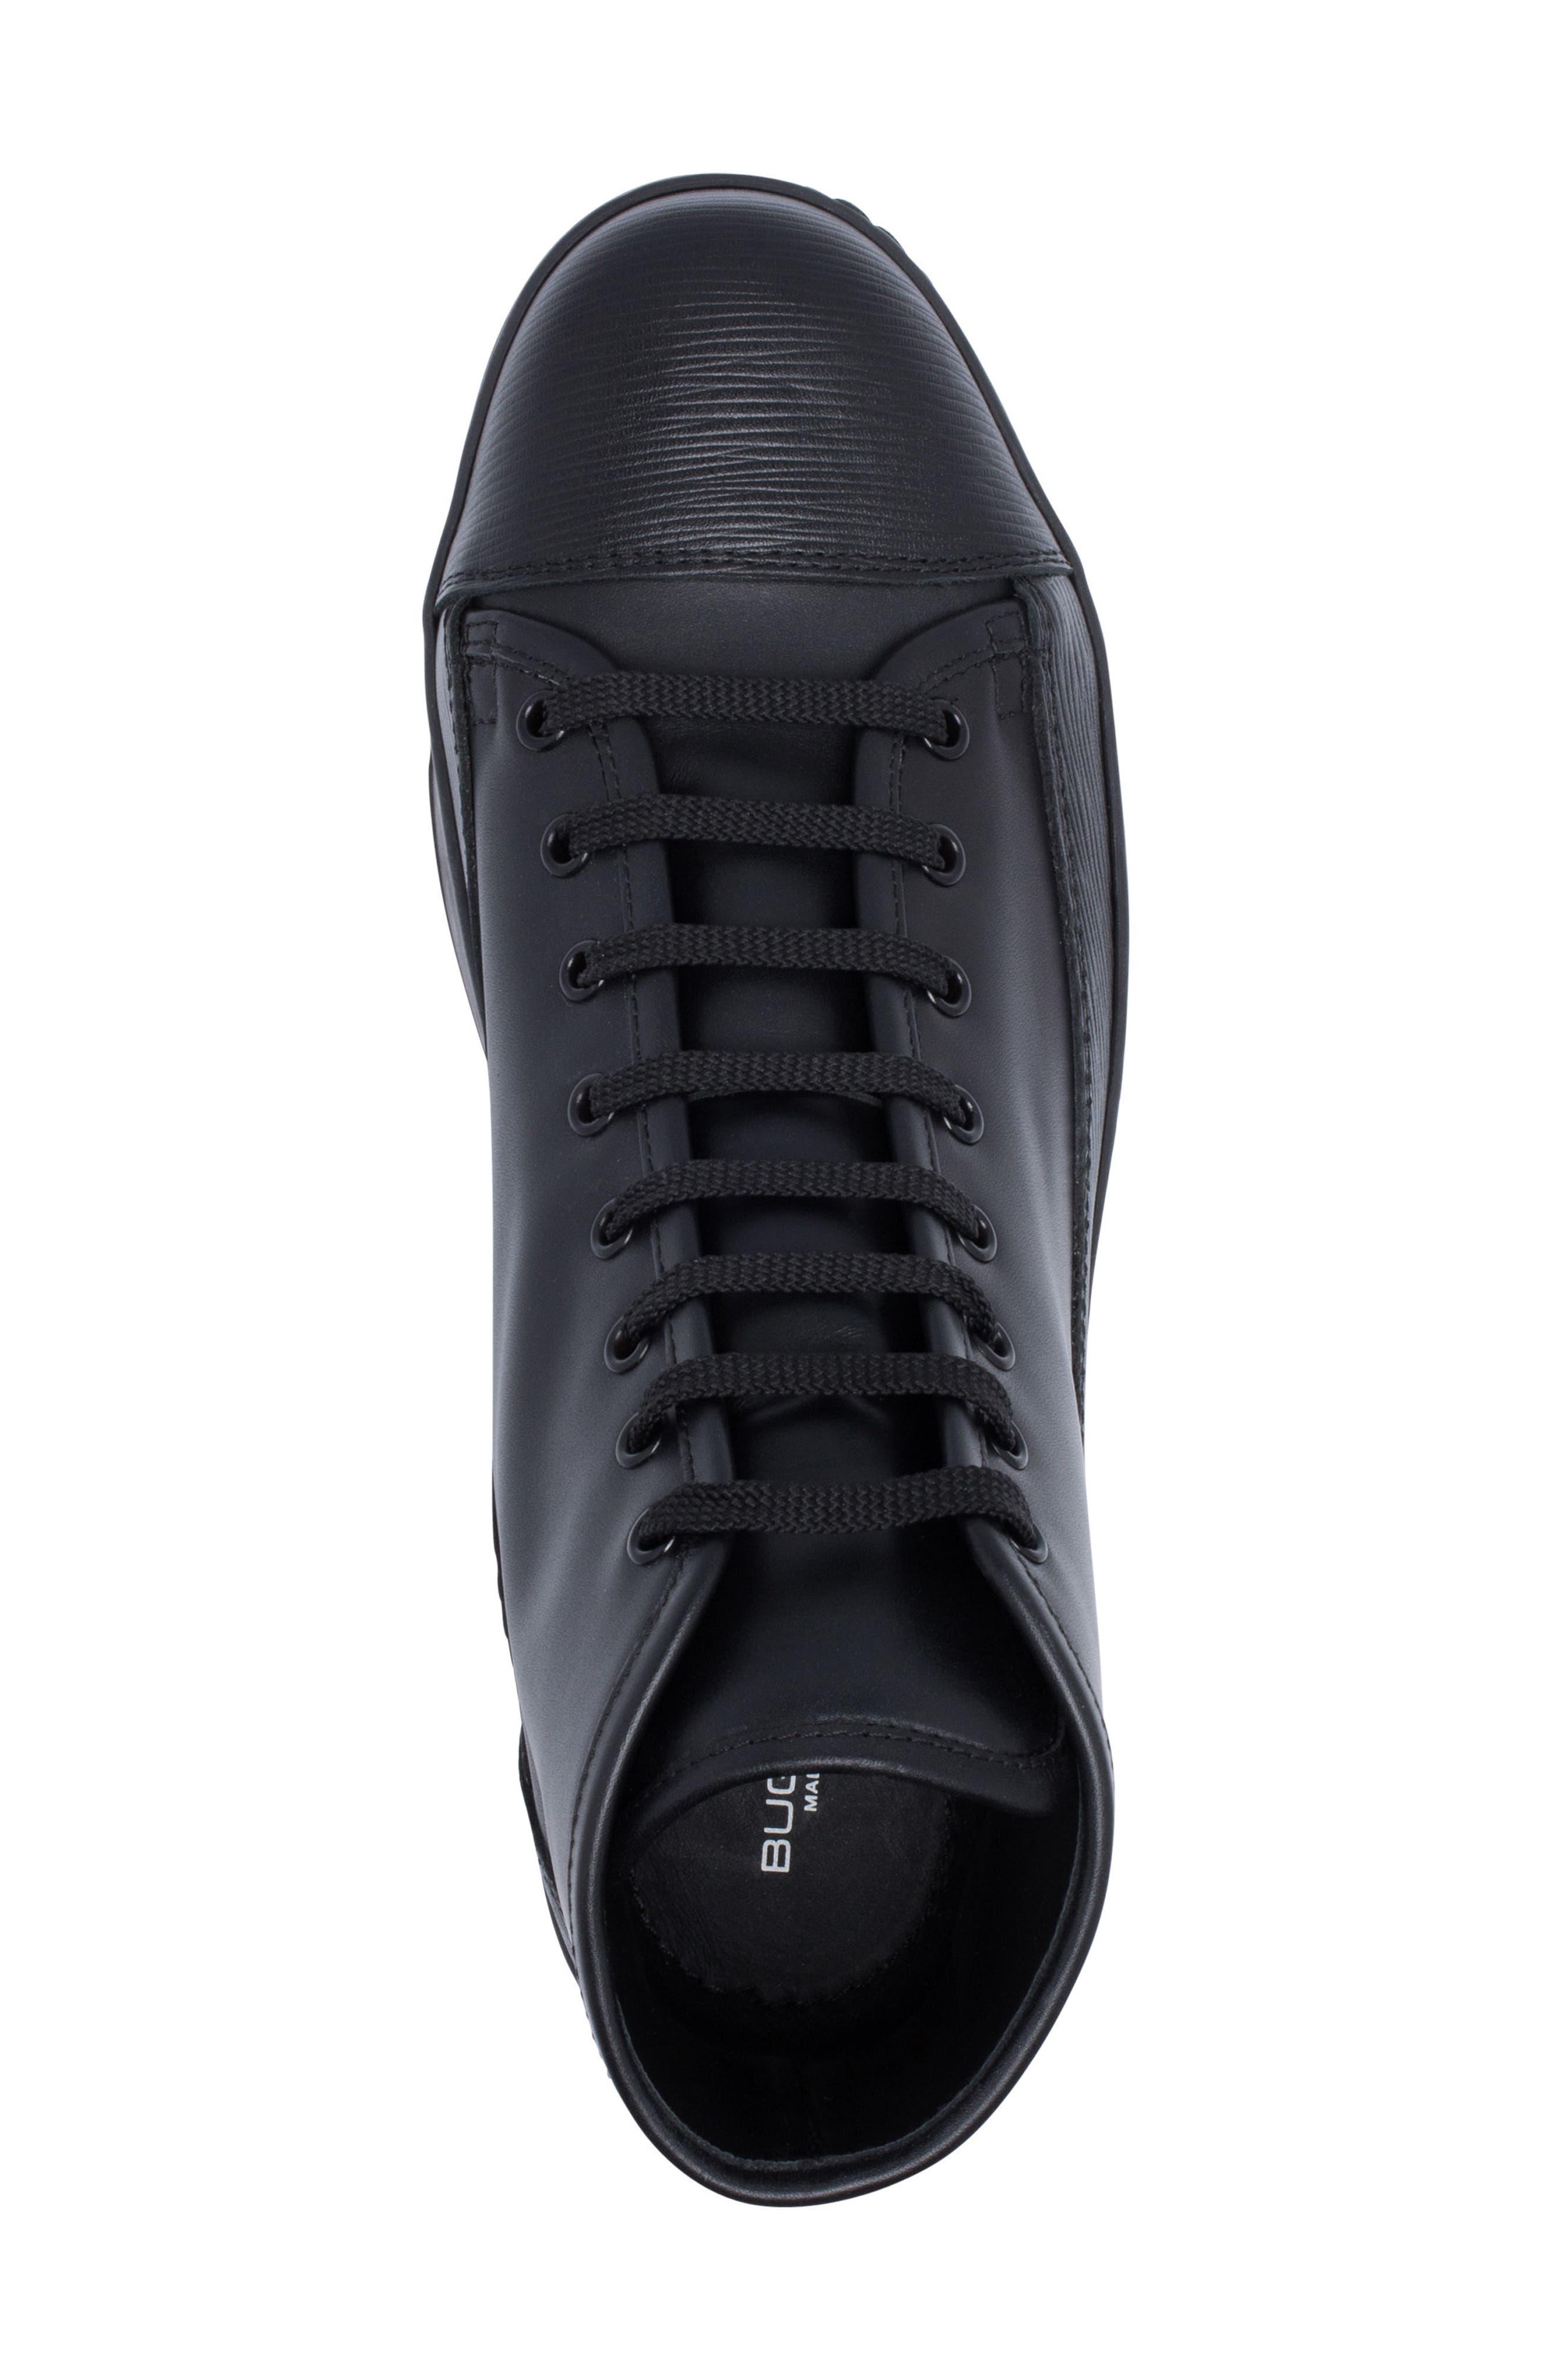 Livorno High Top Sneaker,                             Alternate thumbnail 5, color,                             NERO